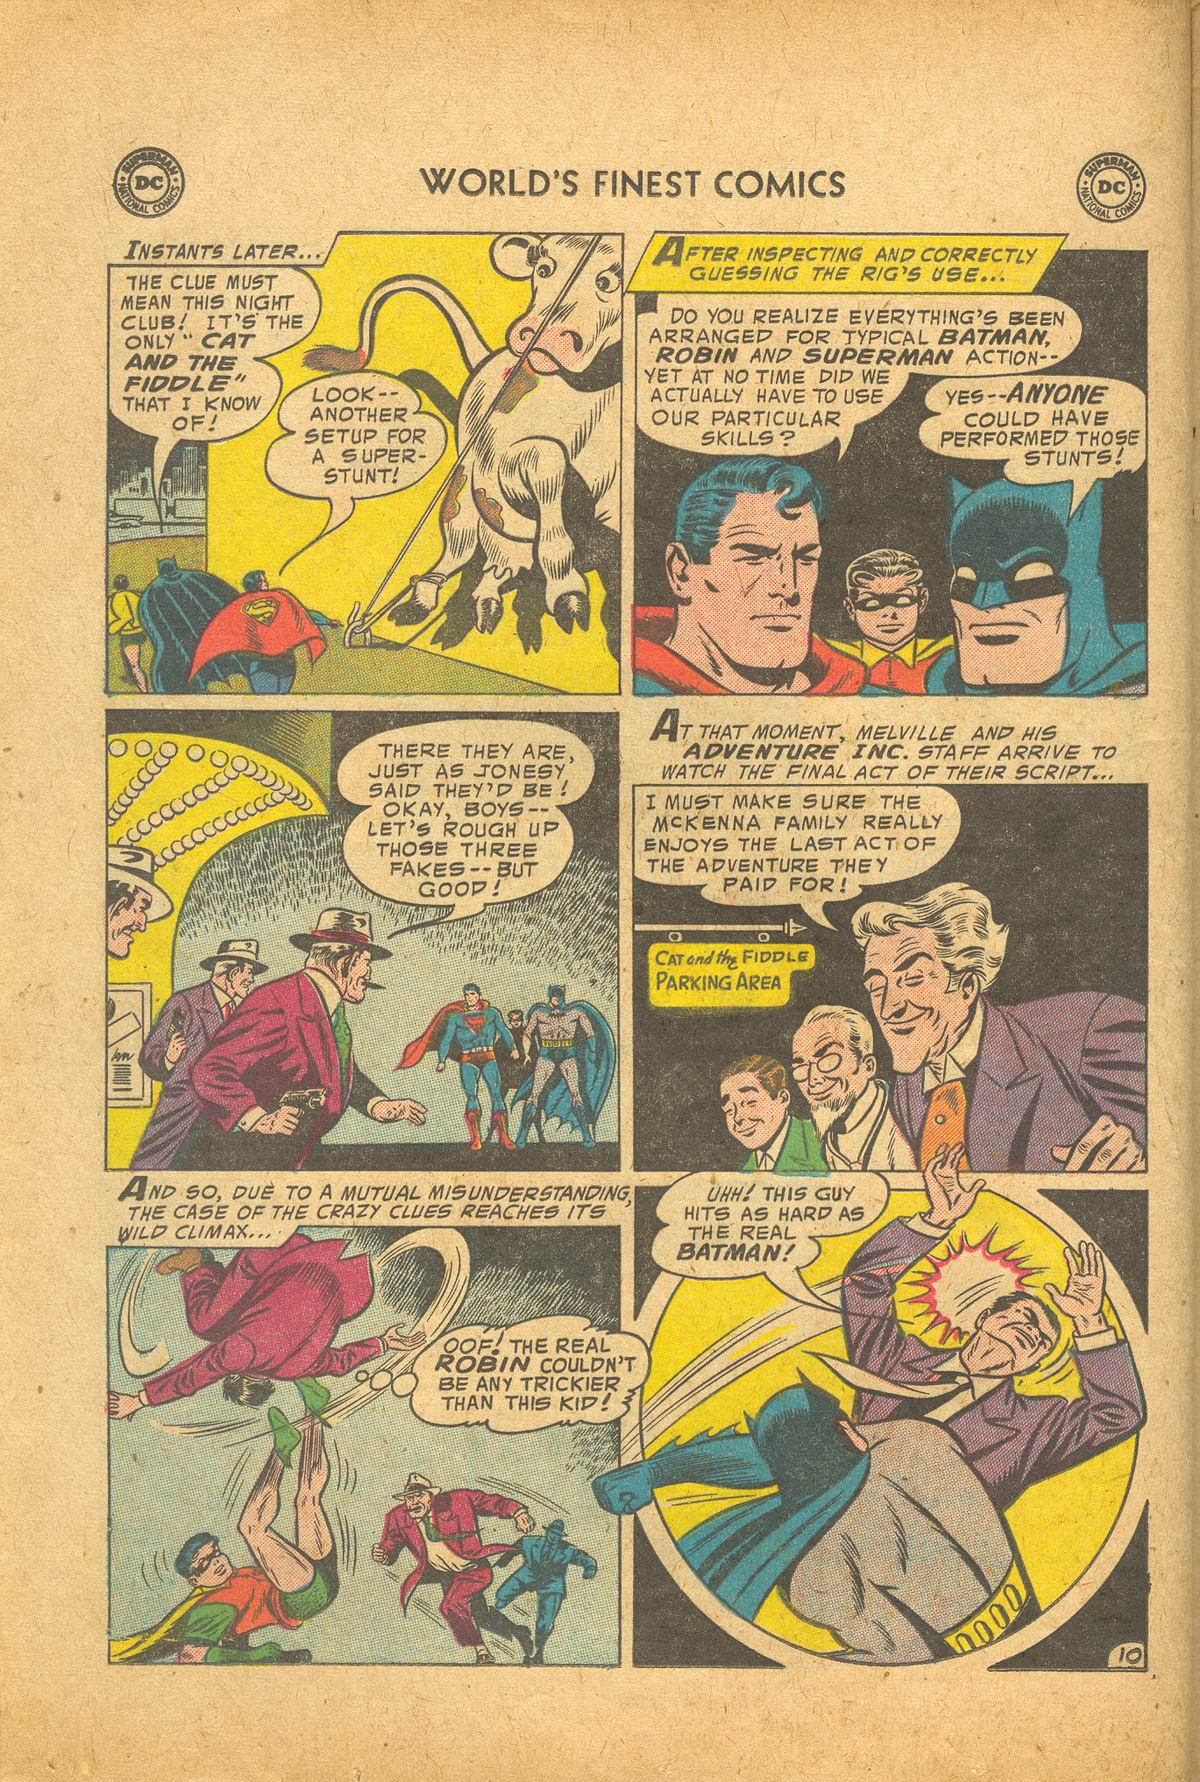 Read online World's Finest Comics comic -  Issue #83 - 12